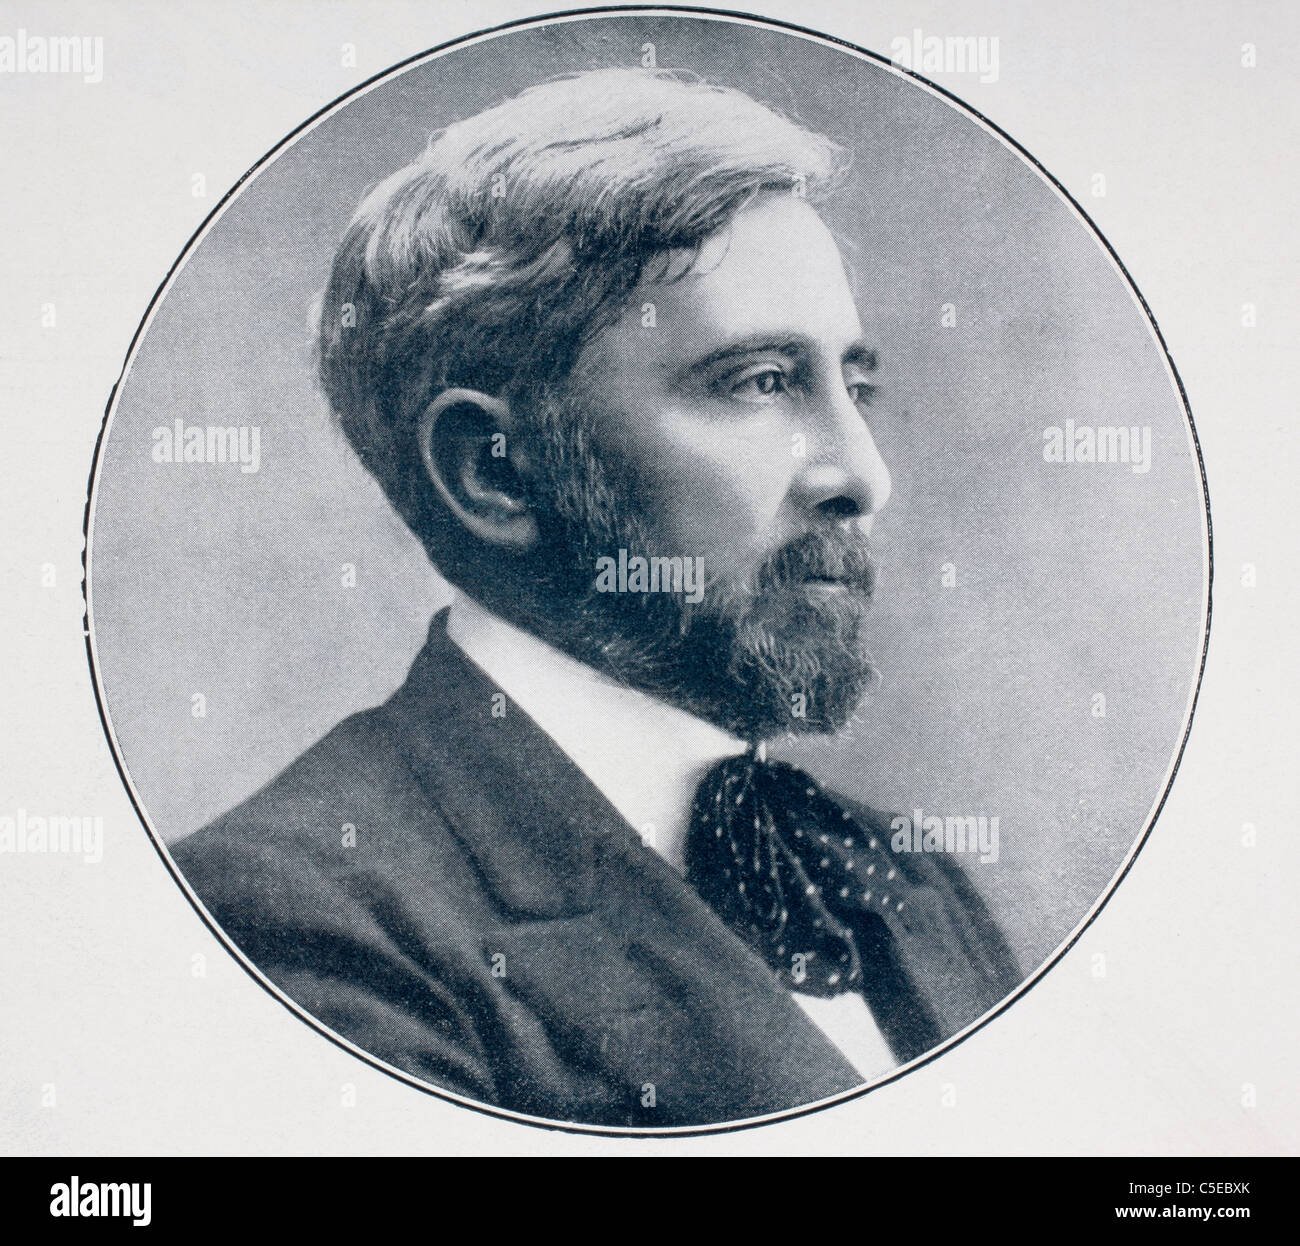 Arturo Reyes Aguilar, 1864 - 1913. Spanish poet and journalist. - Stock Image